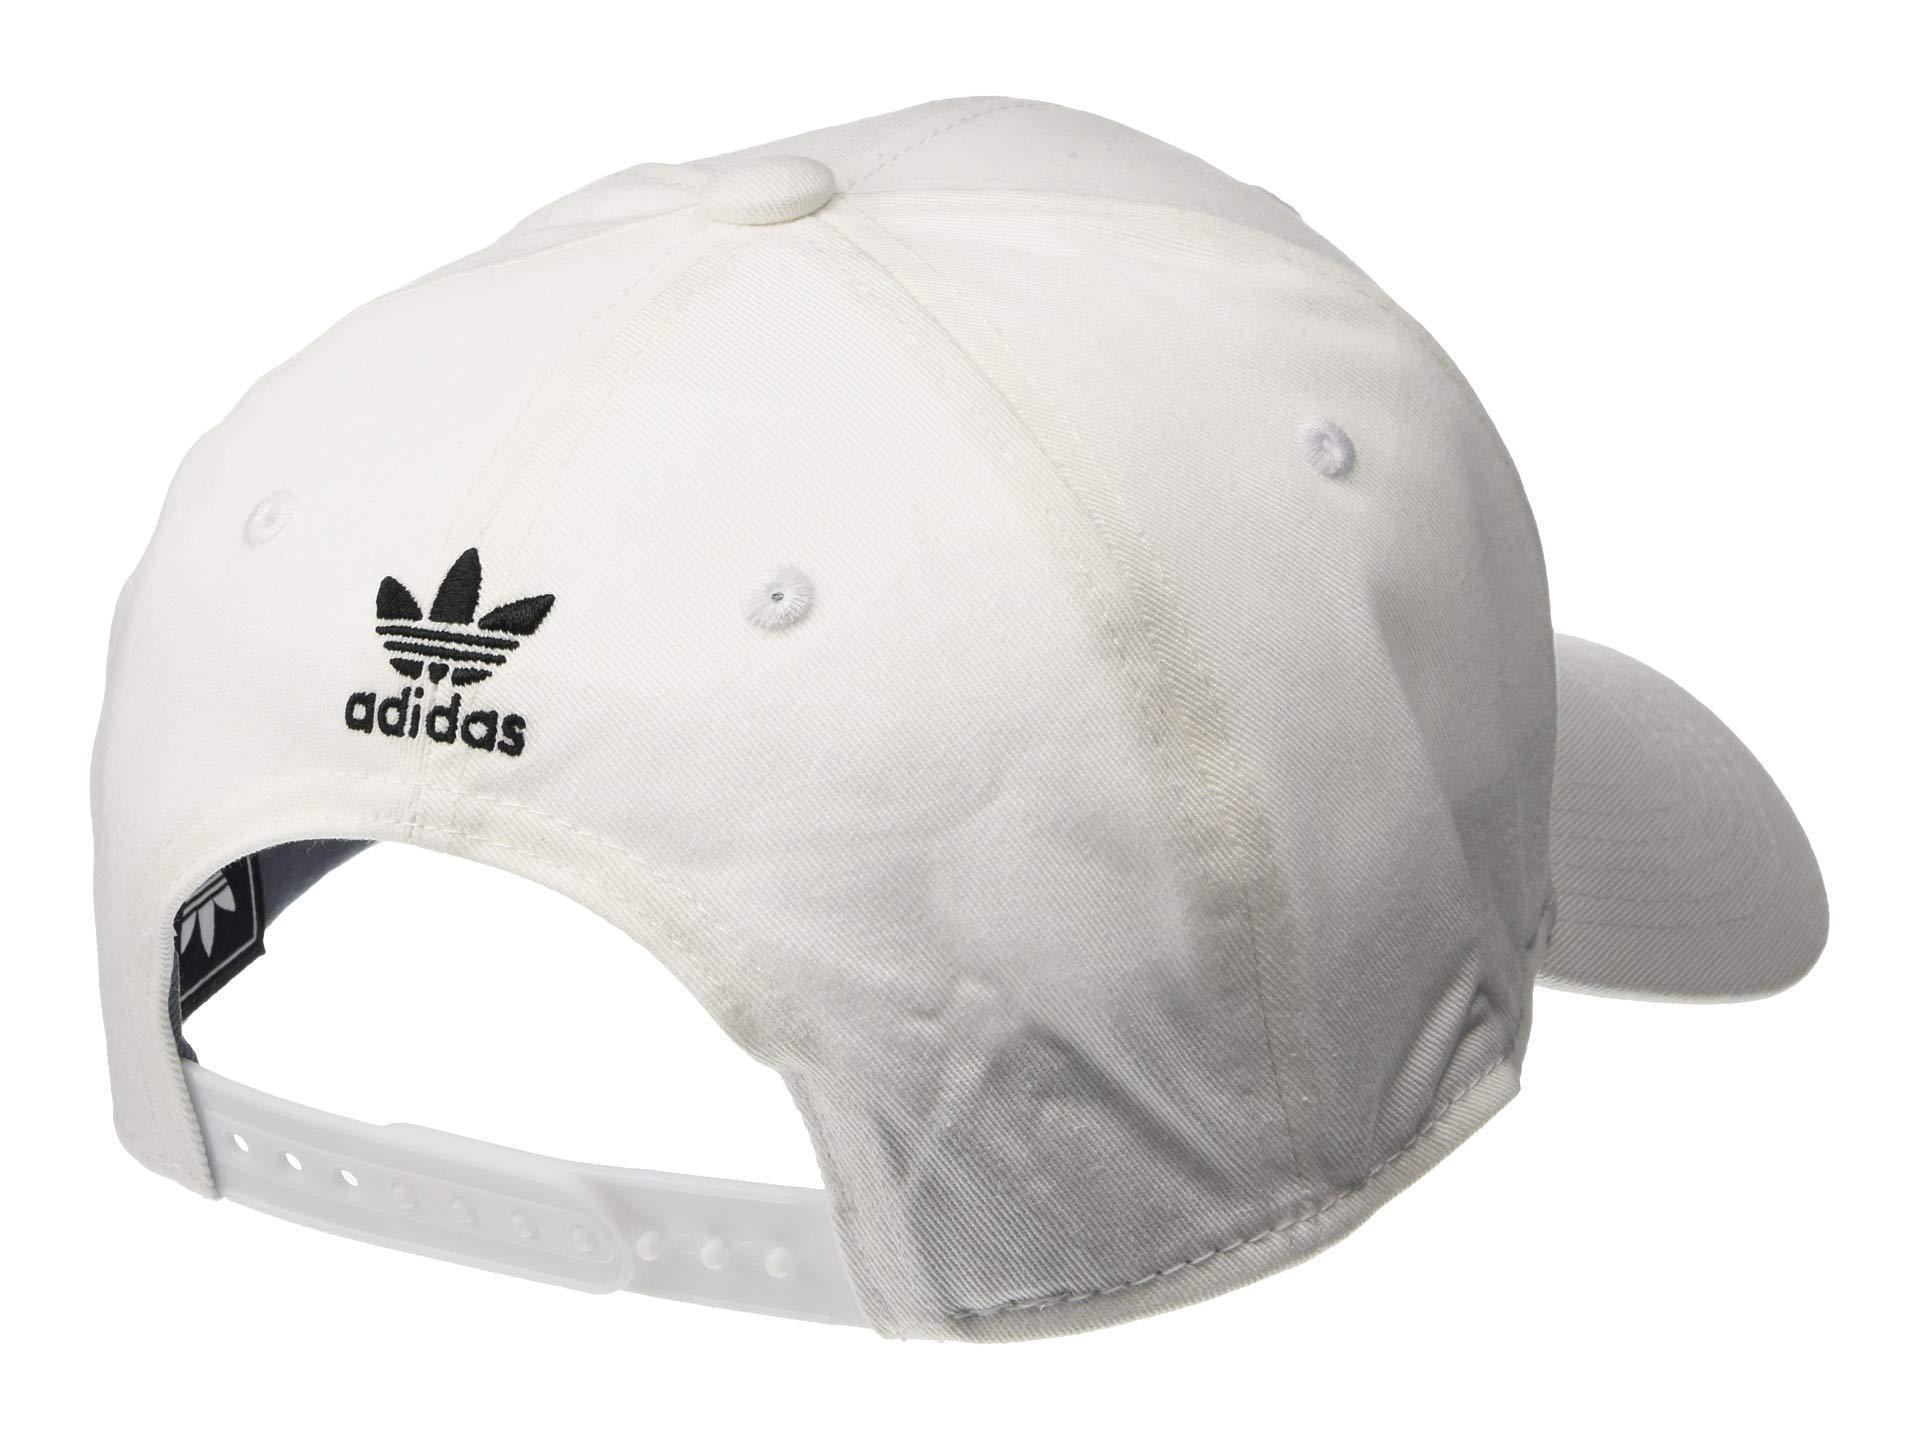 37b95c42c20 Adidas Originals - White Relaxed Strapback Cap for Men - Lyst. View  fullscreen